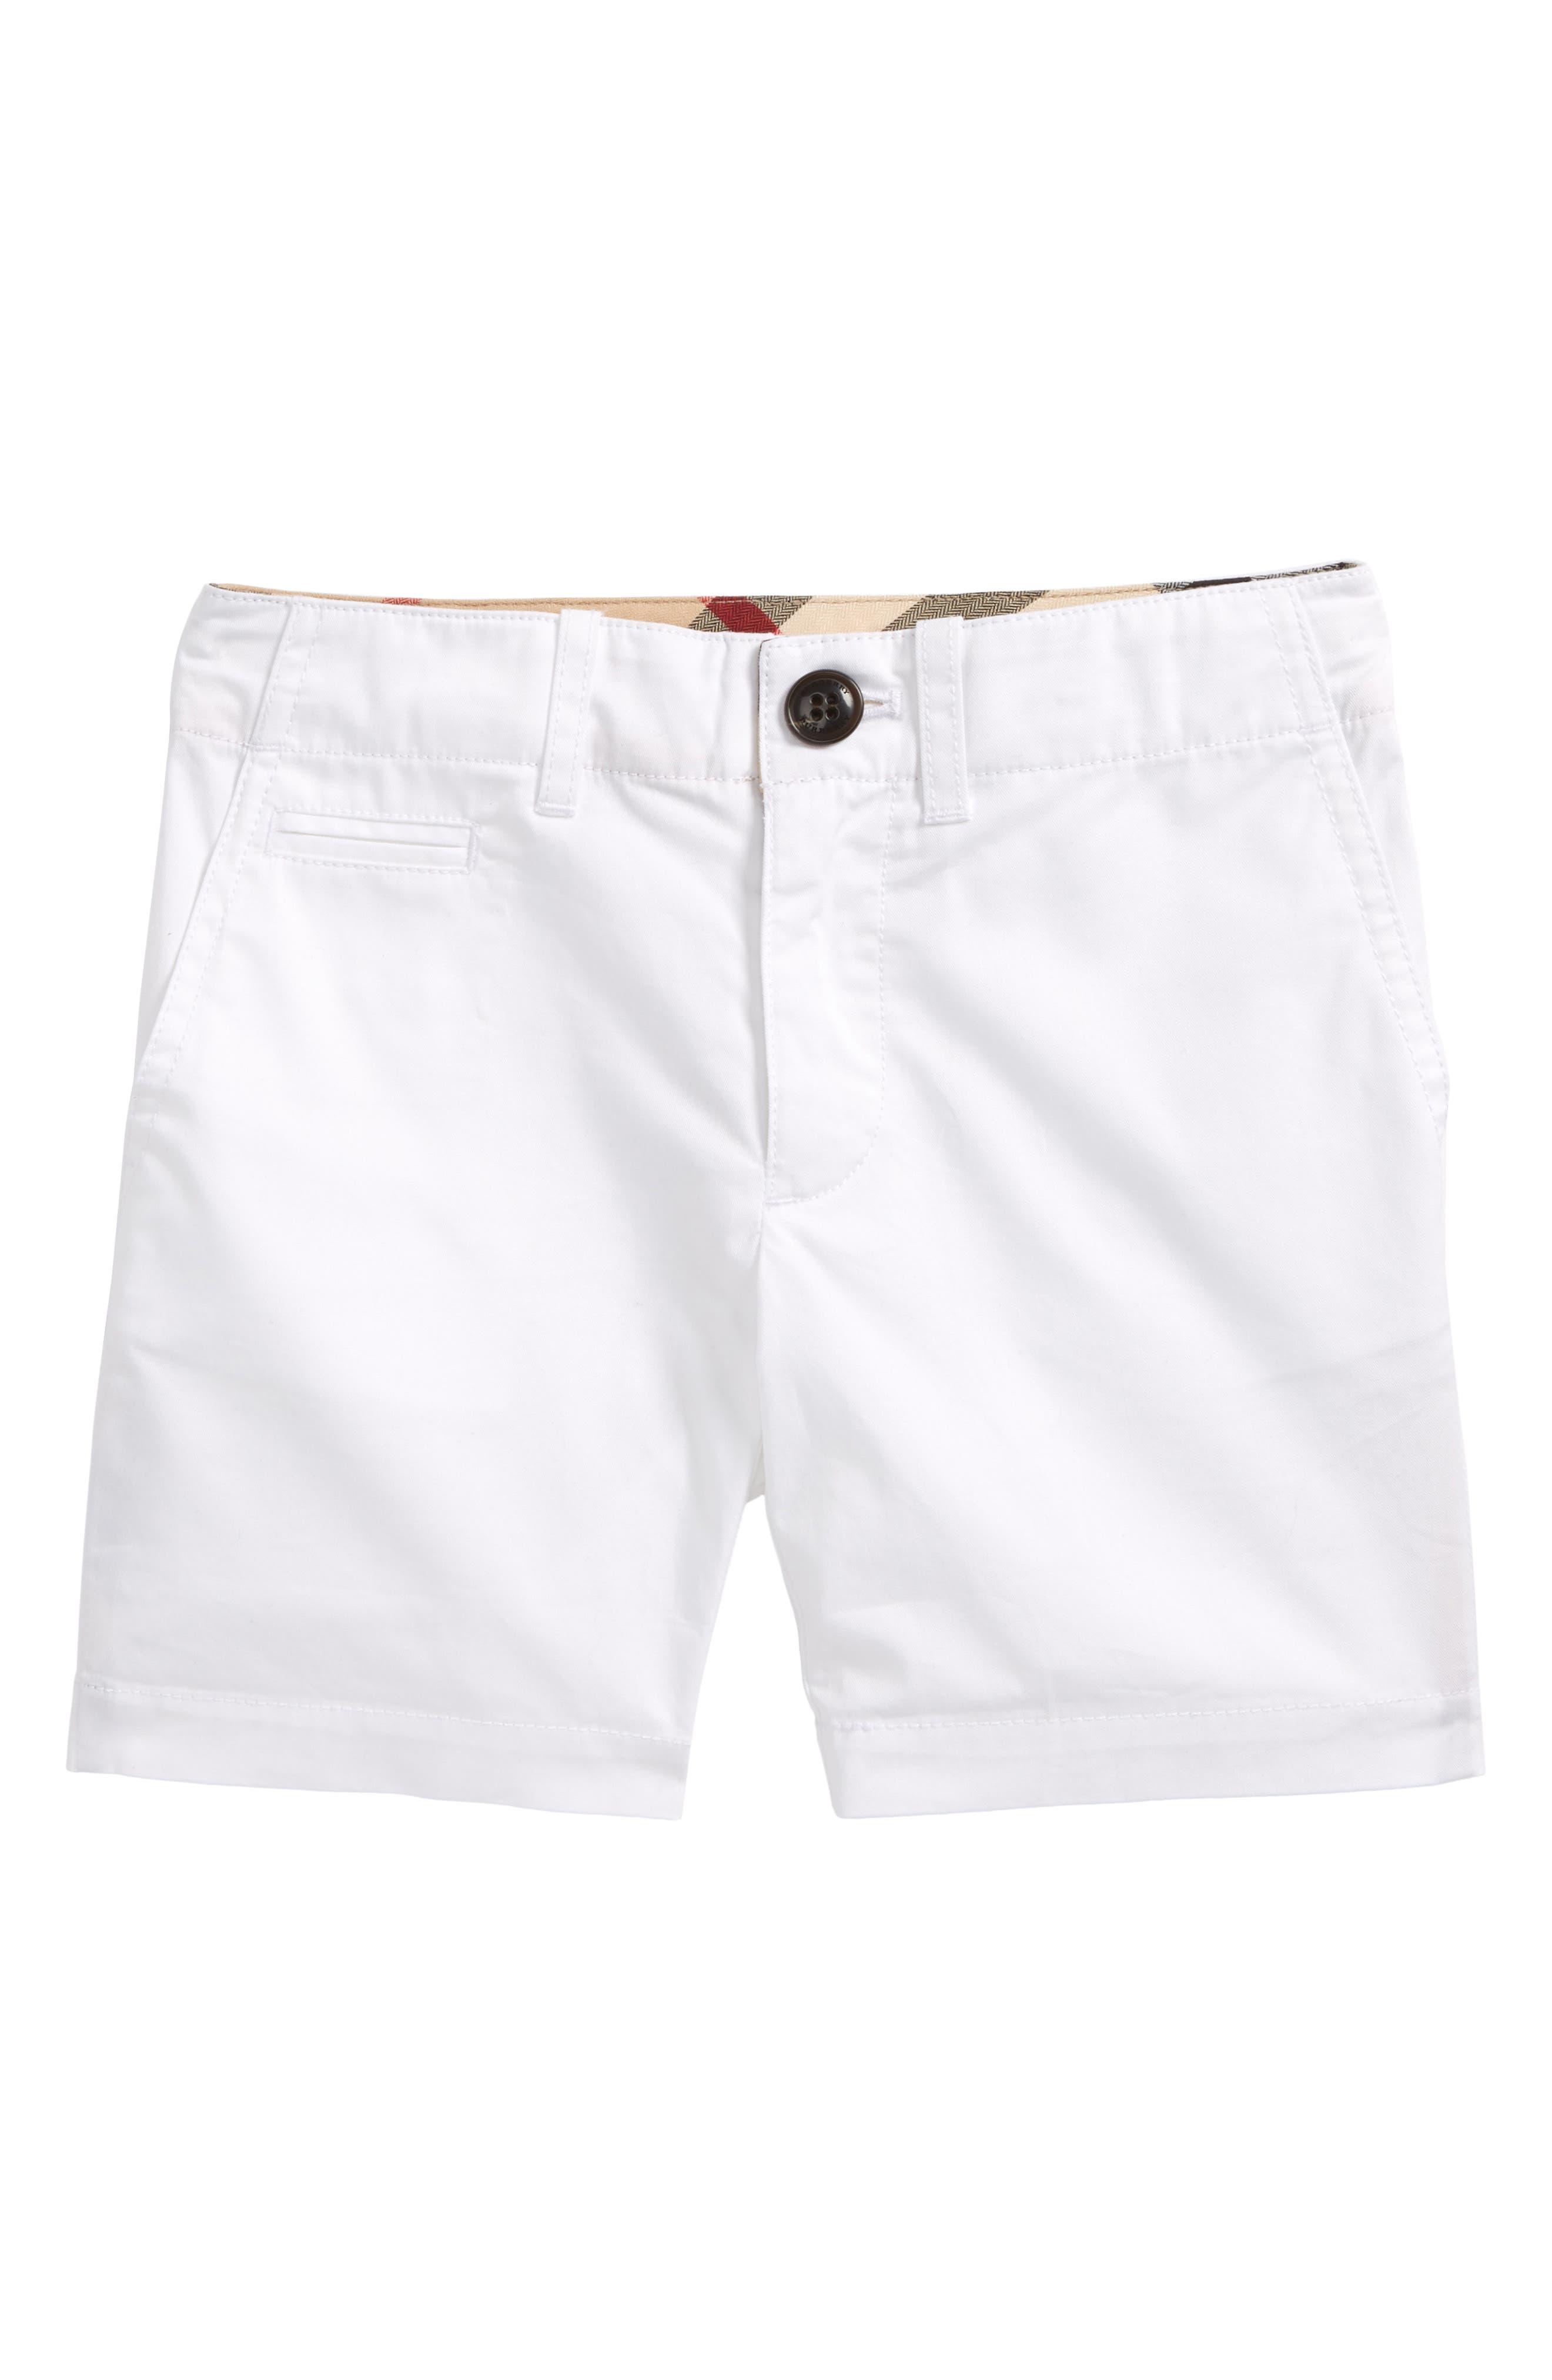 Tina Cotton Twill Shorts,                         Main,                         color, White